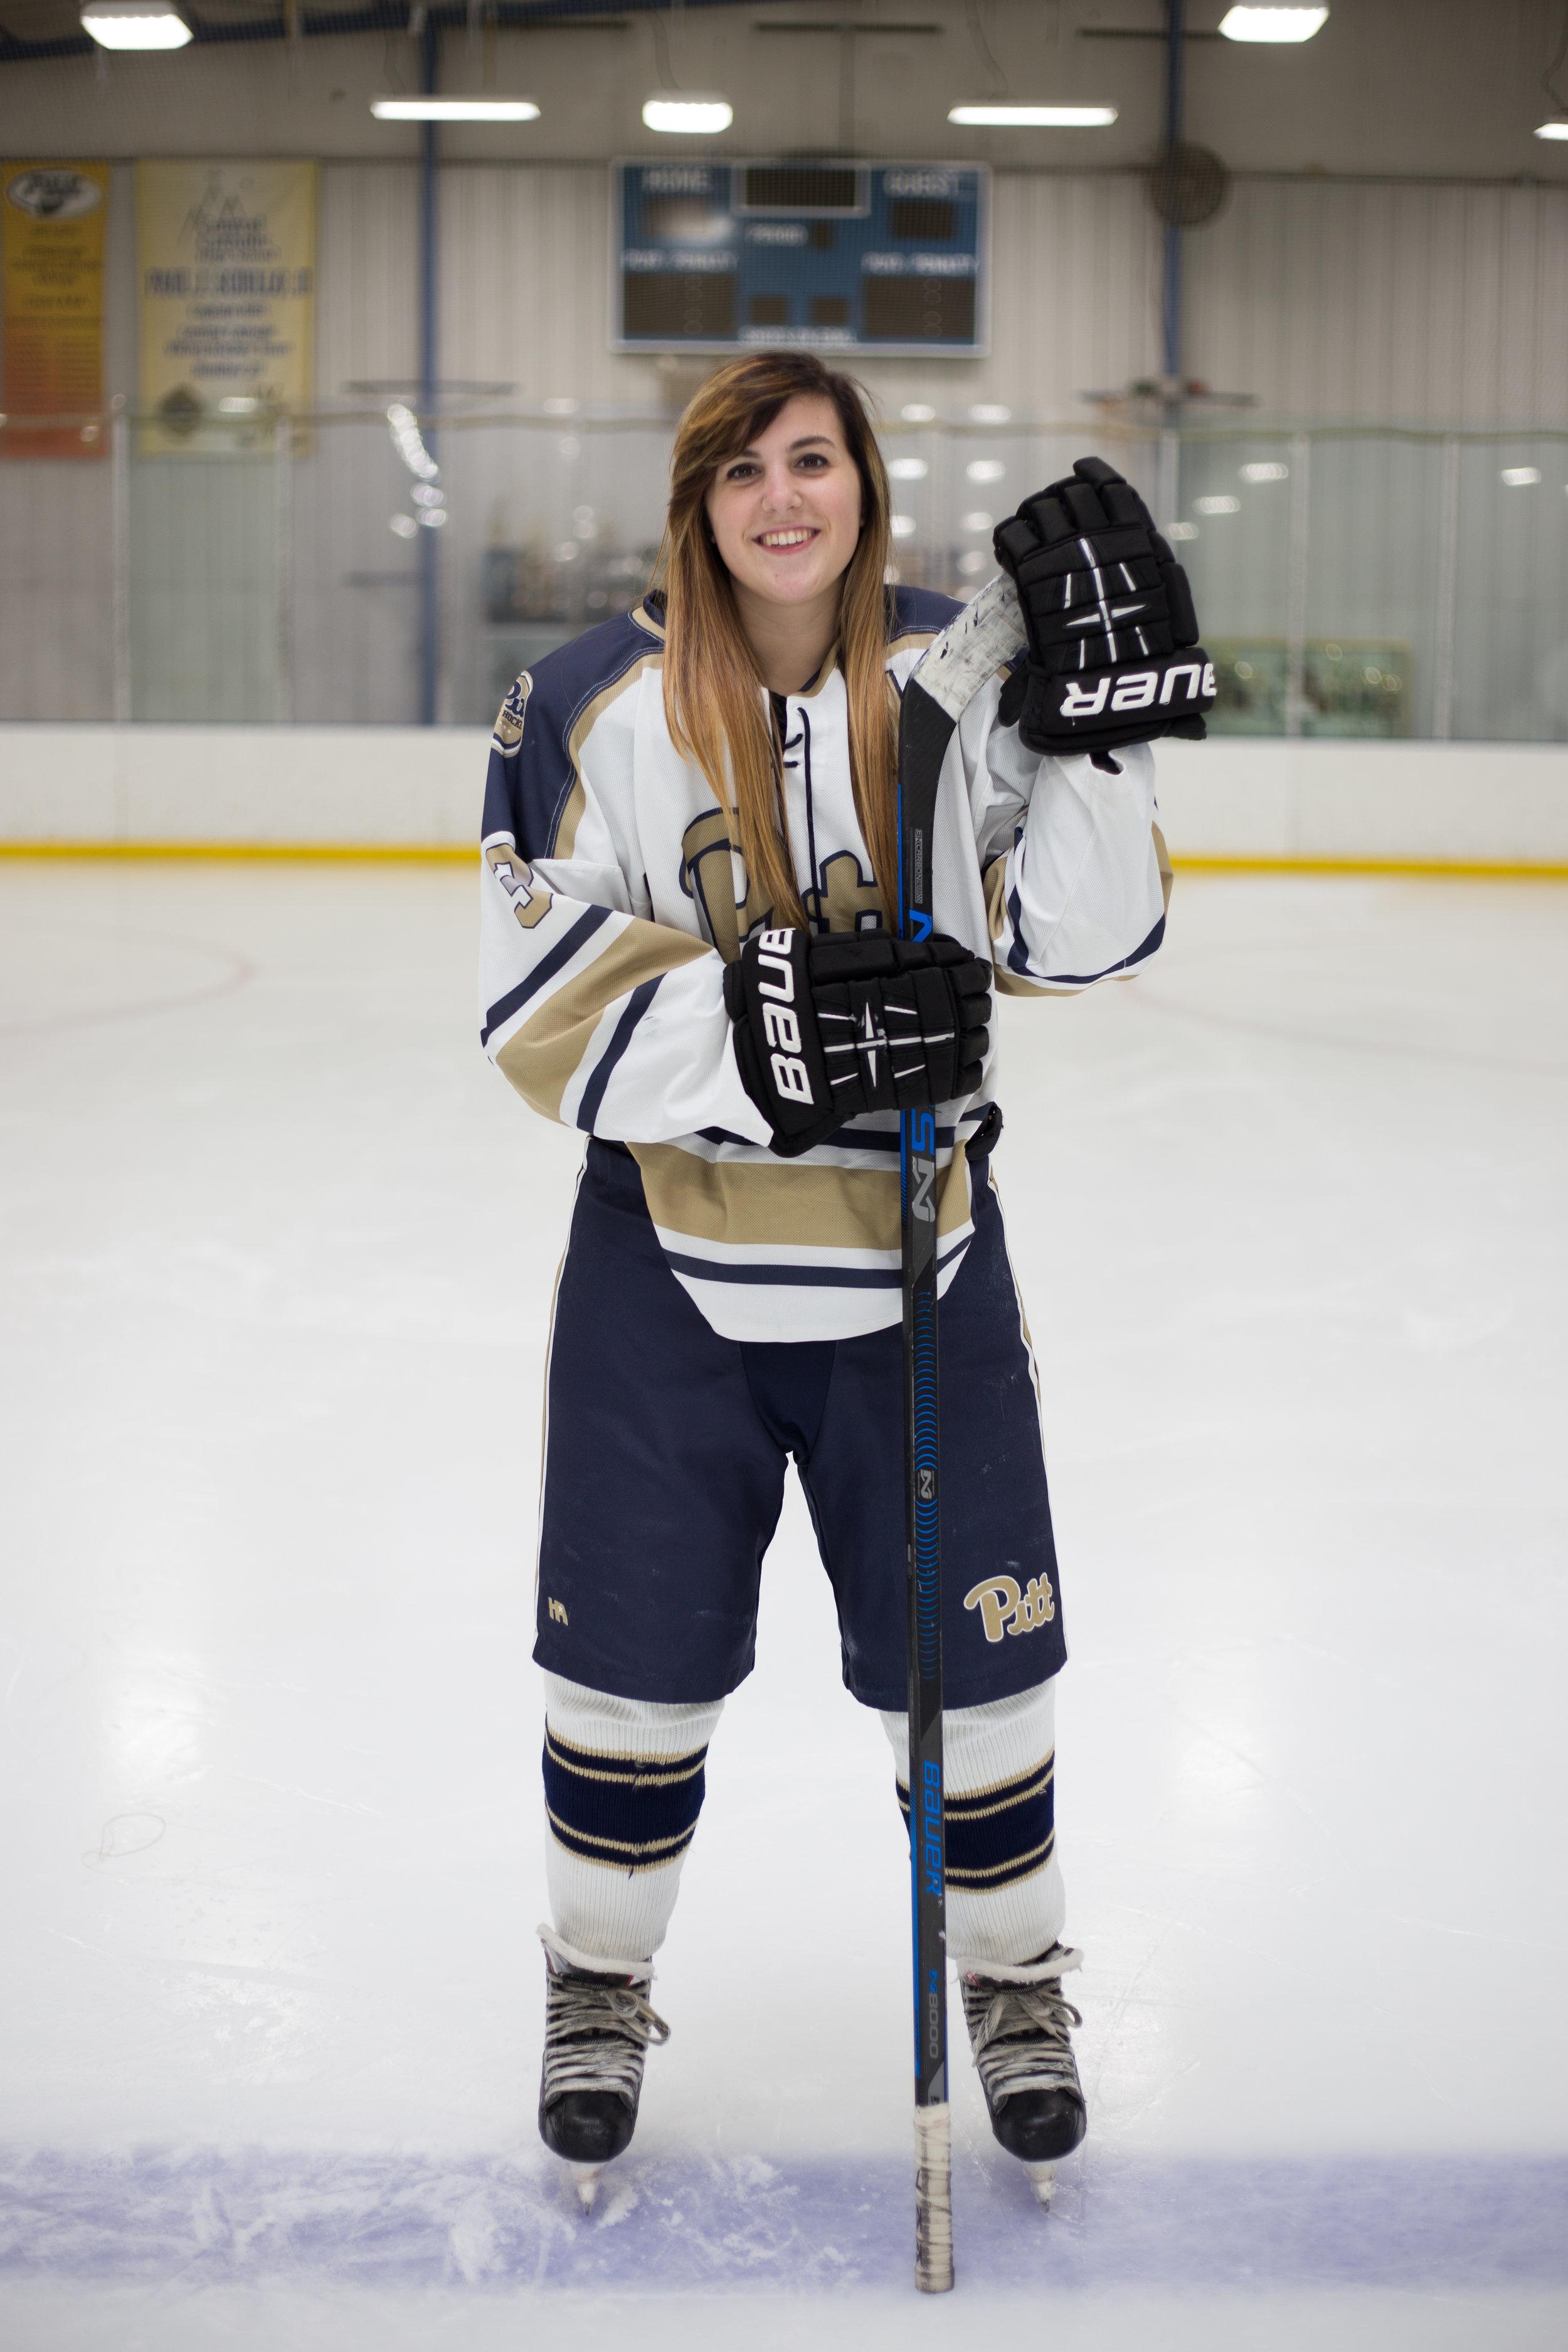 hockeyPortraits-61.JPG